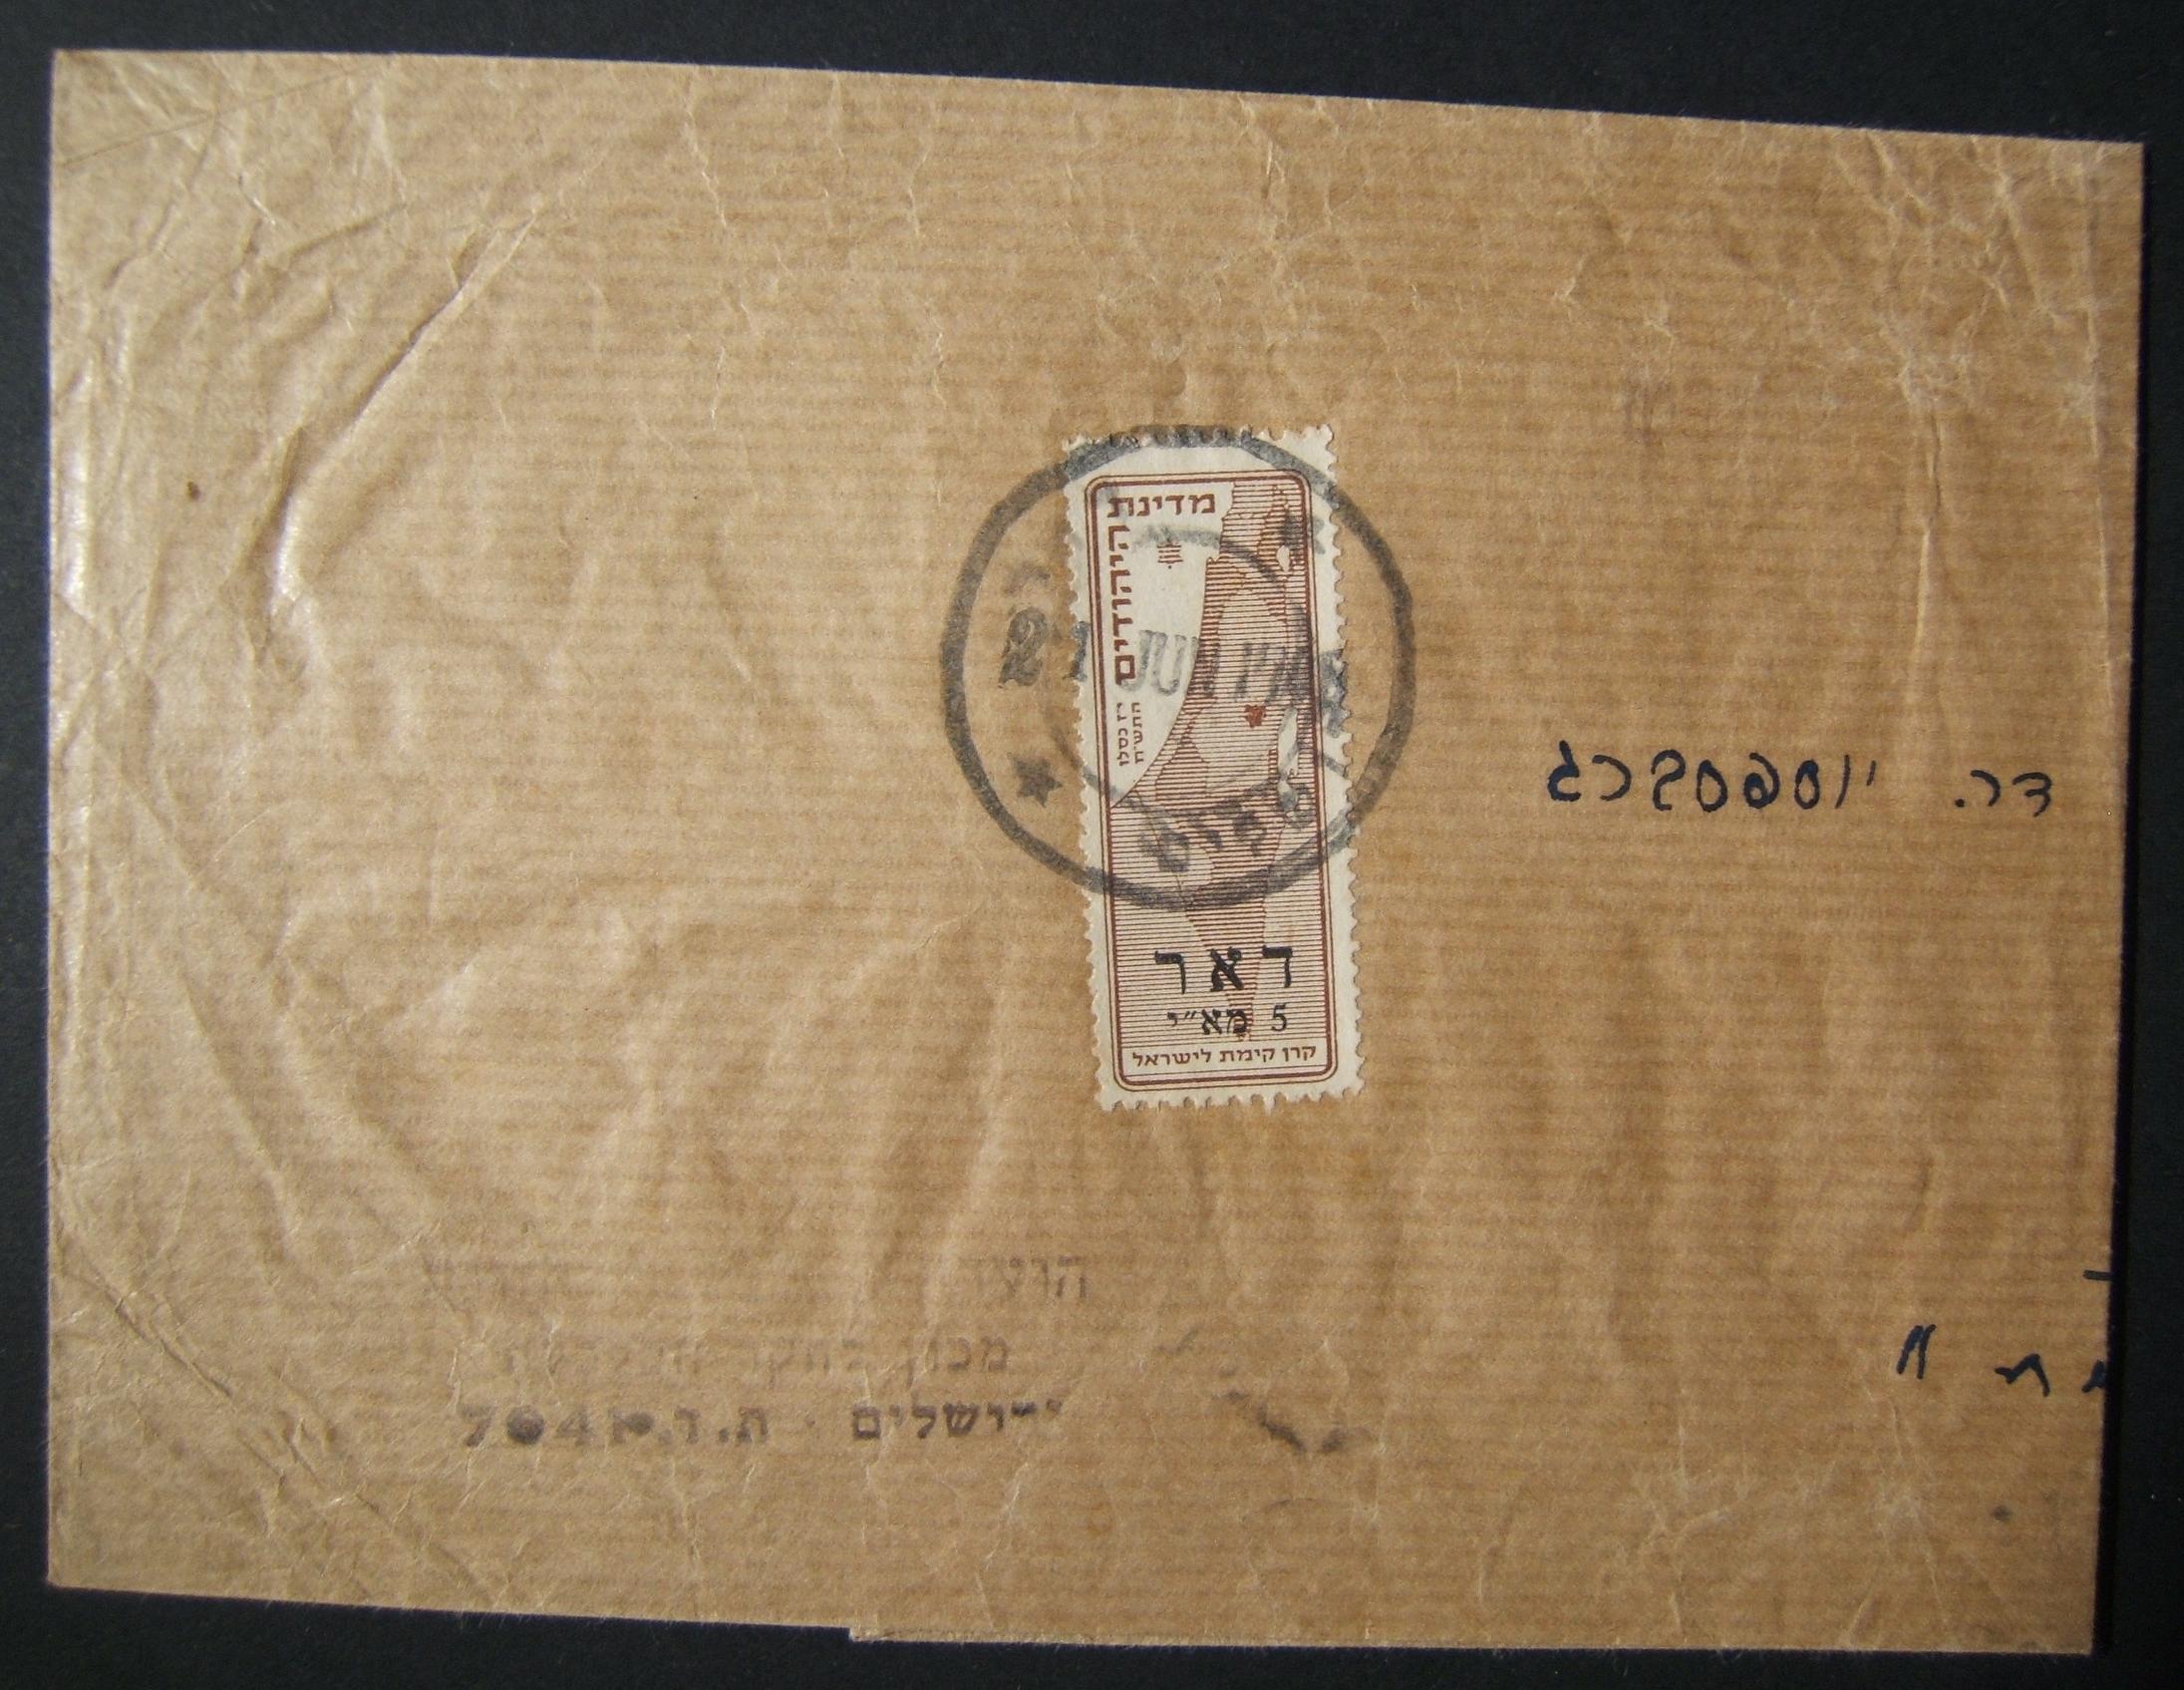 1948 Jerusalem printed matter mail to Petach Tikva franked by rare 3rd interim series stamp